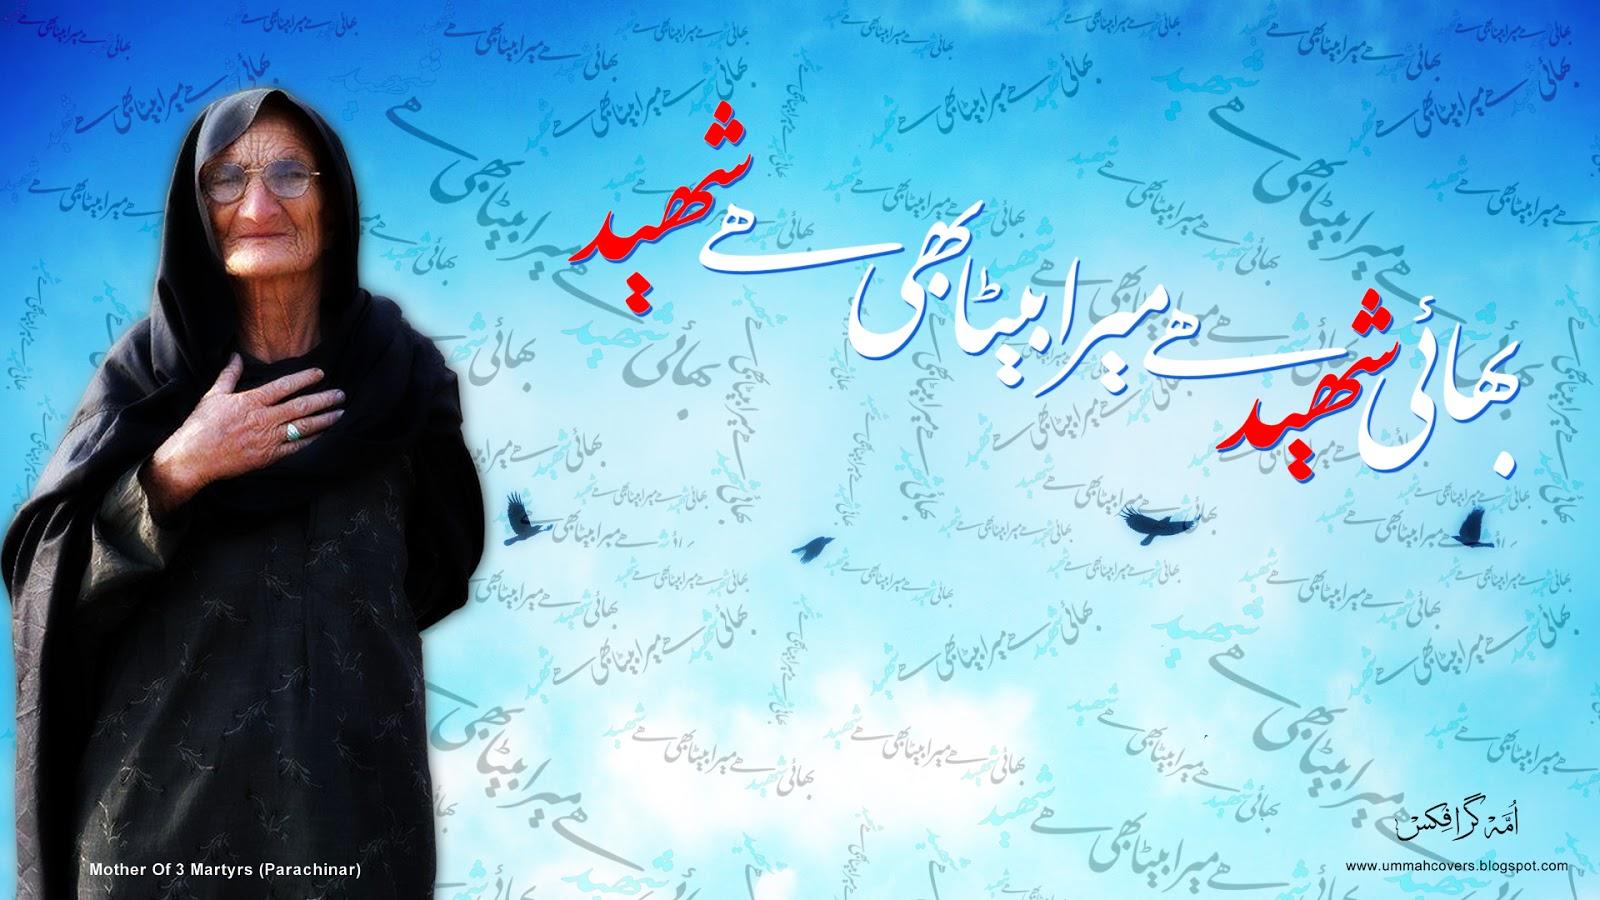 Maula Ali Shrine Wallpaper: FreWalpict: Ya Hussain Wallpapers Hd